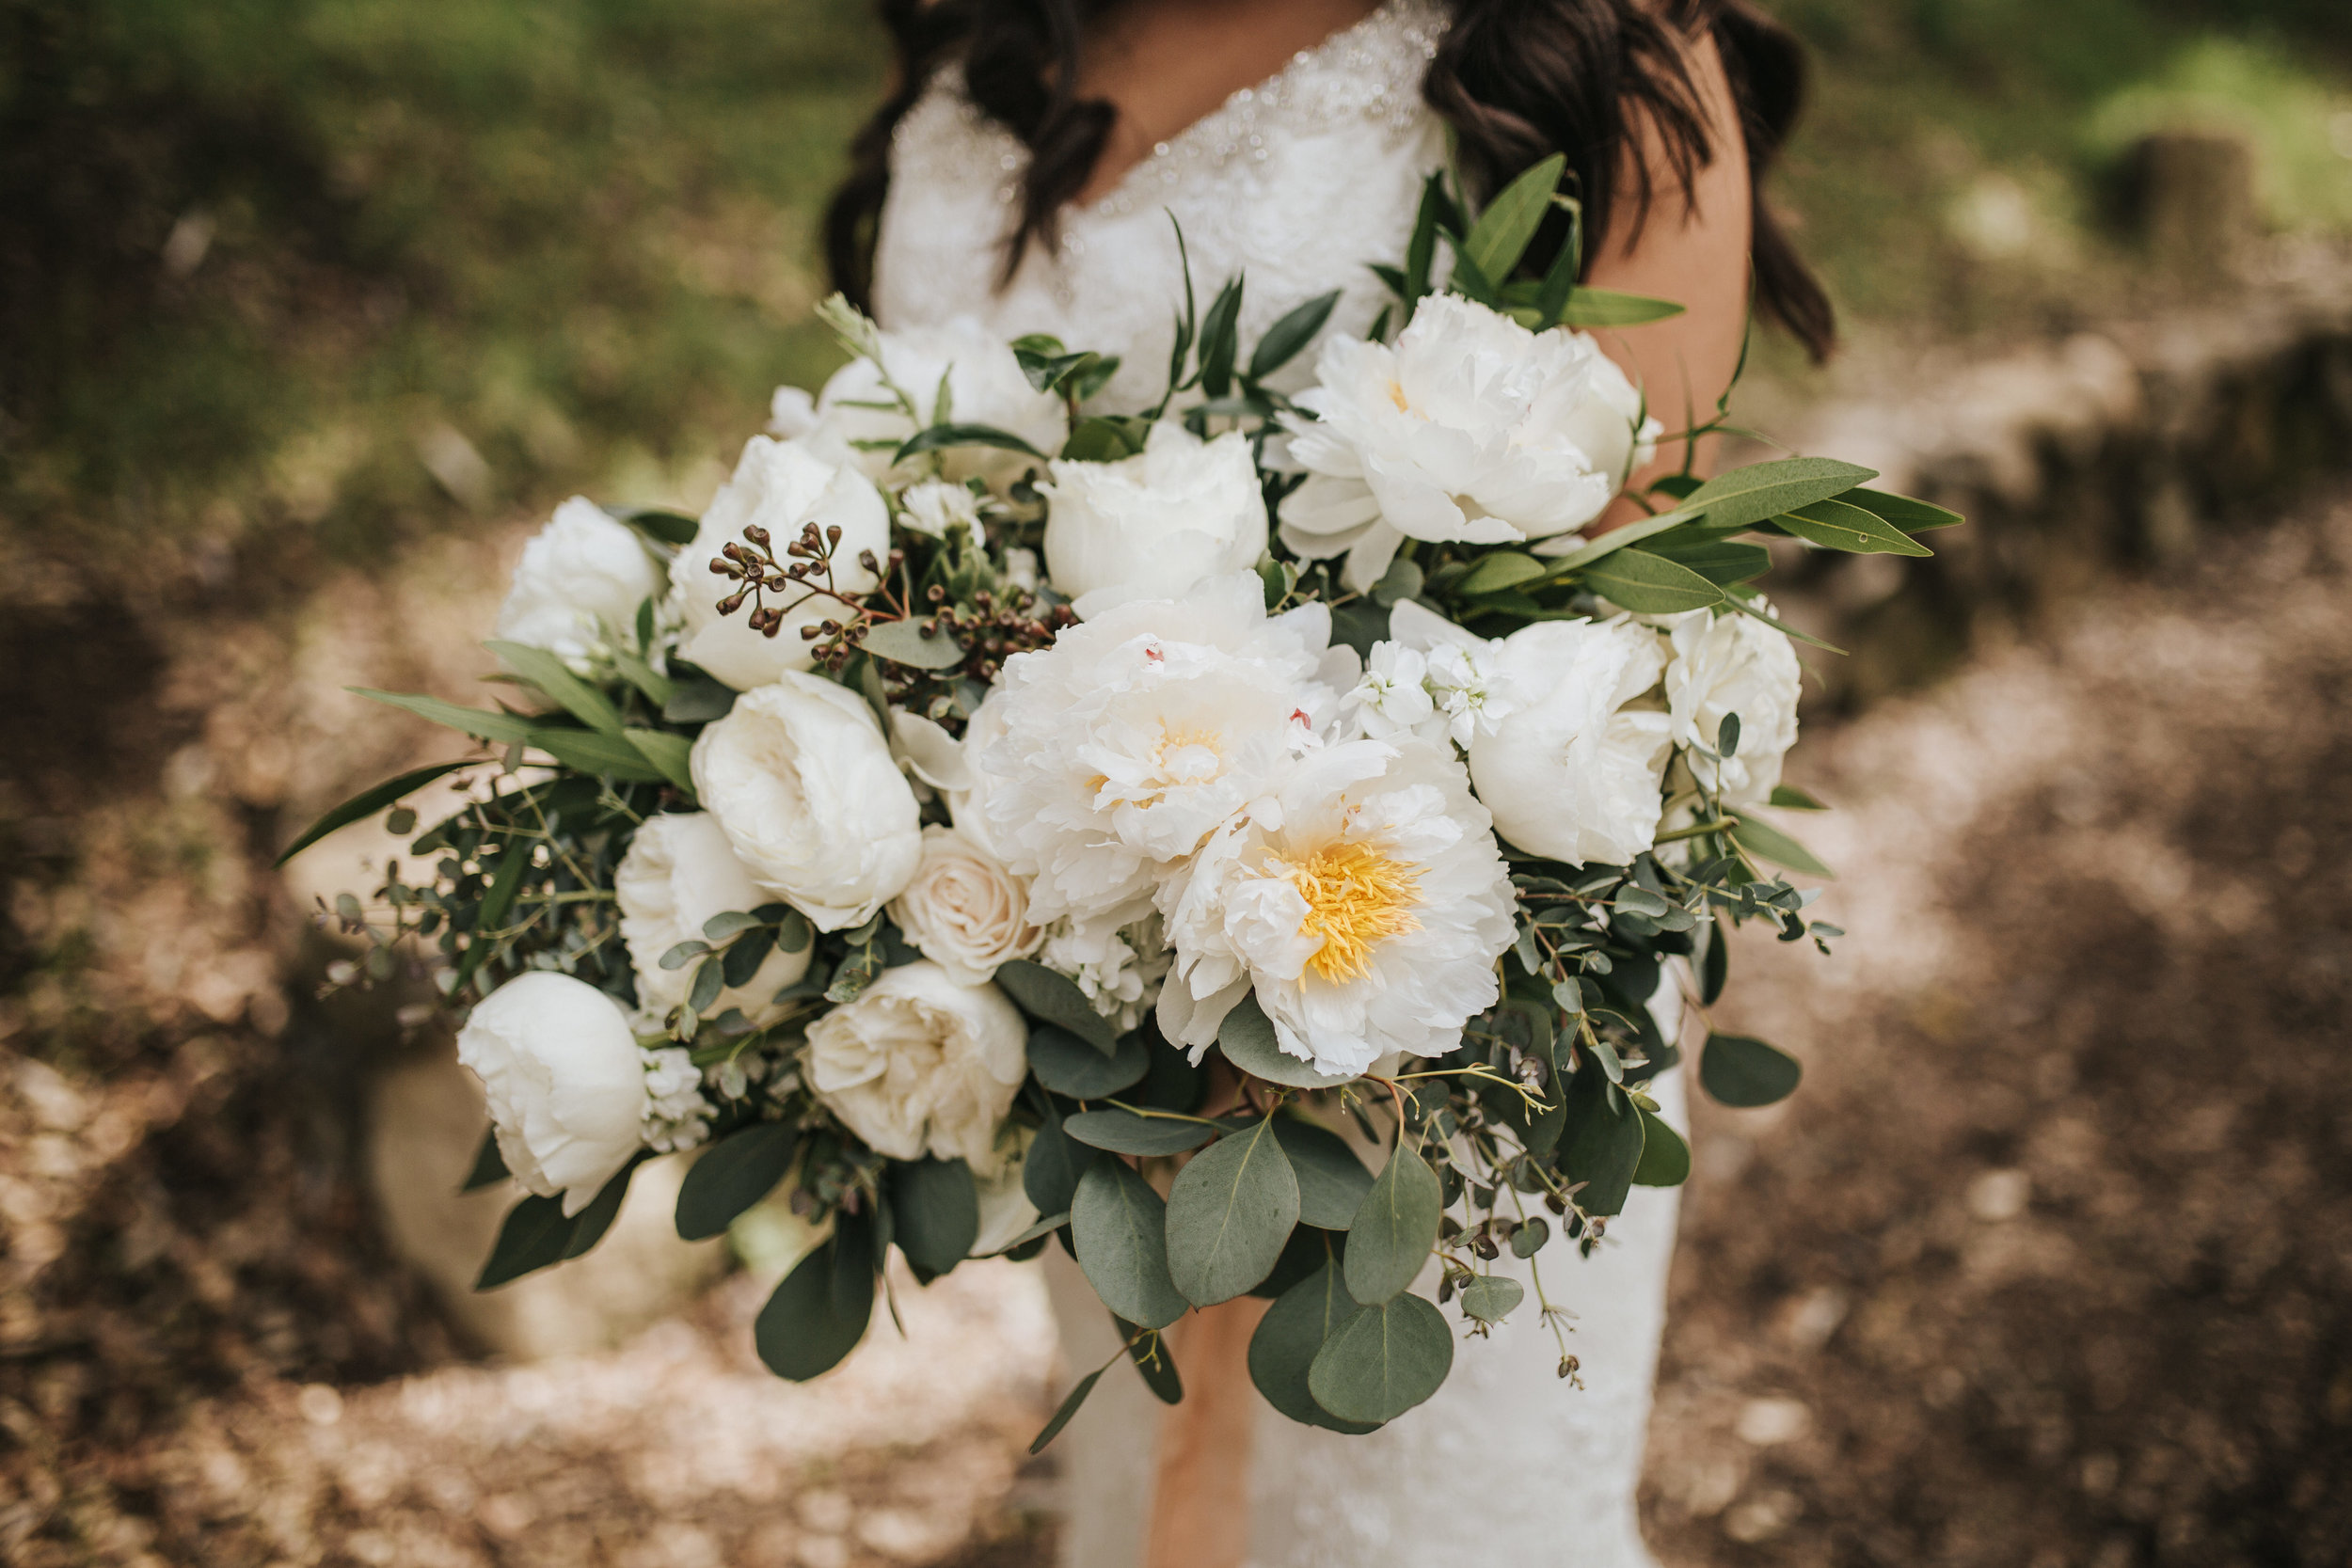 The 1909, The 1909 Wedding, Topanga Canyon Wedding, white peony bridal bouquet, eucalyptus bridal bouquet, peach silk ribbon, blush silk ribbon, white spray rose bouquet